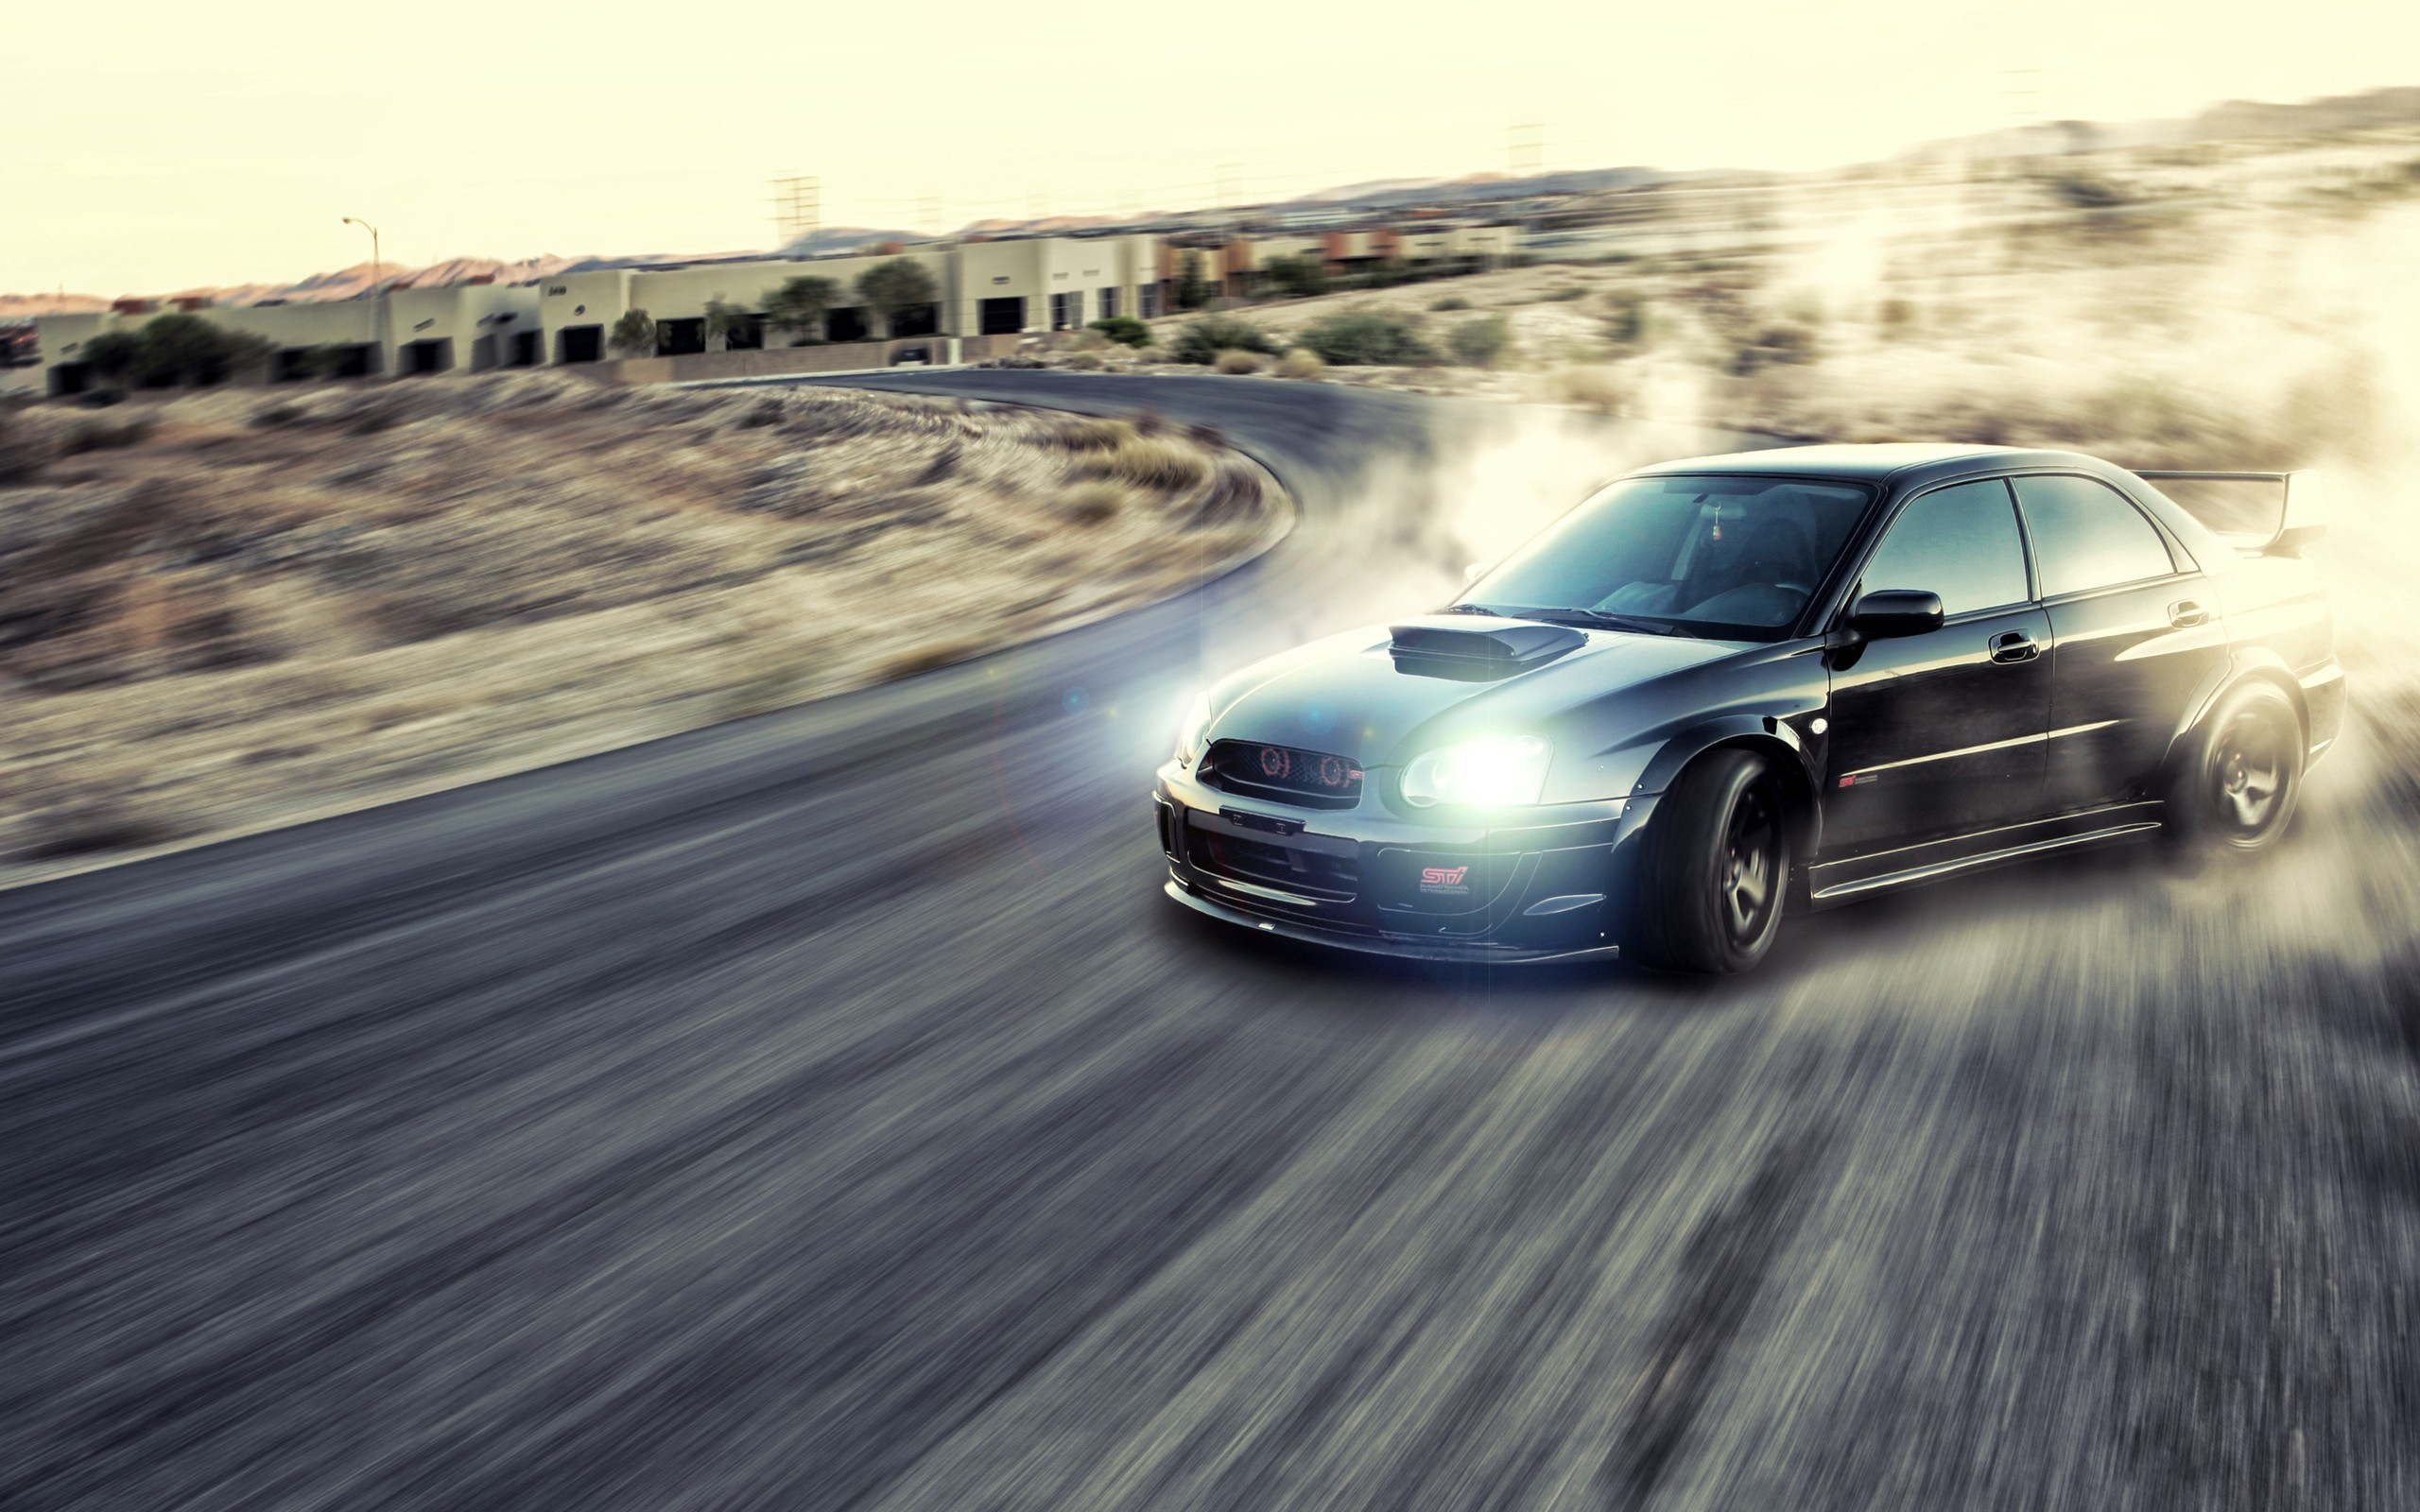 Subaru Drifting, HD Cars, 4k Wallpapers, Images